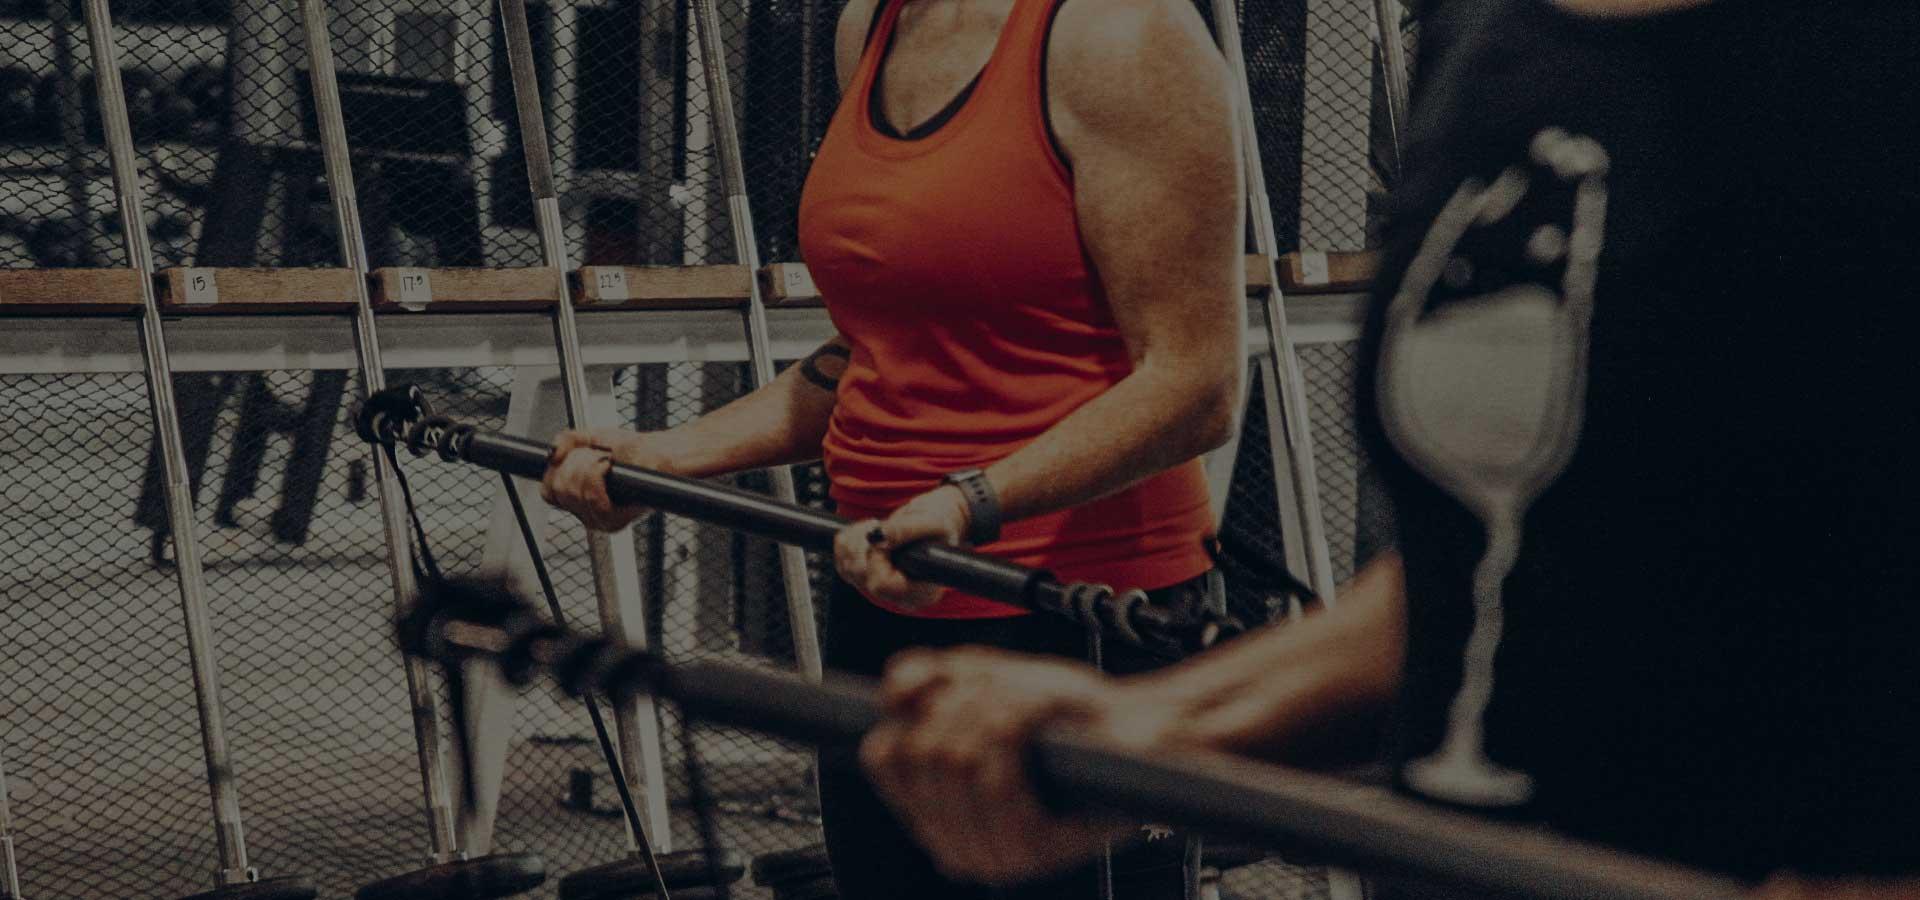 NRG Health & Fitness